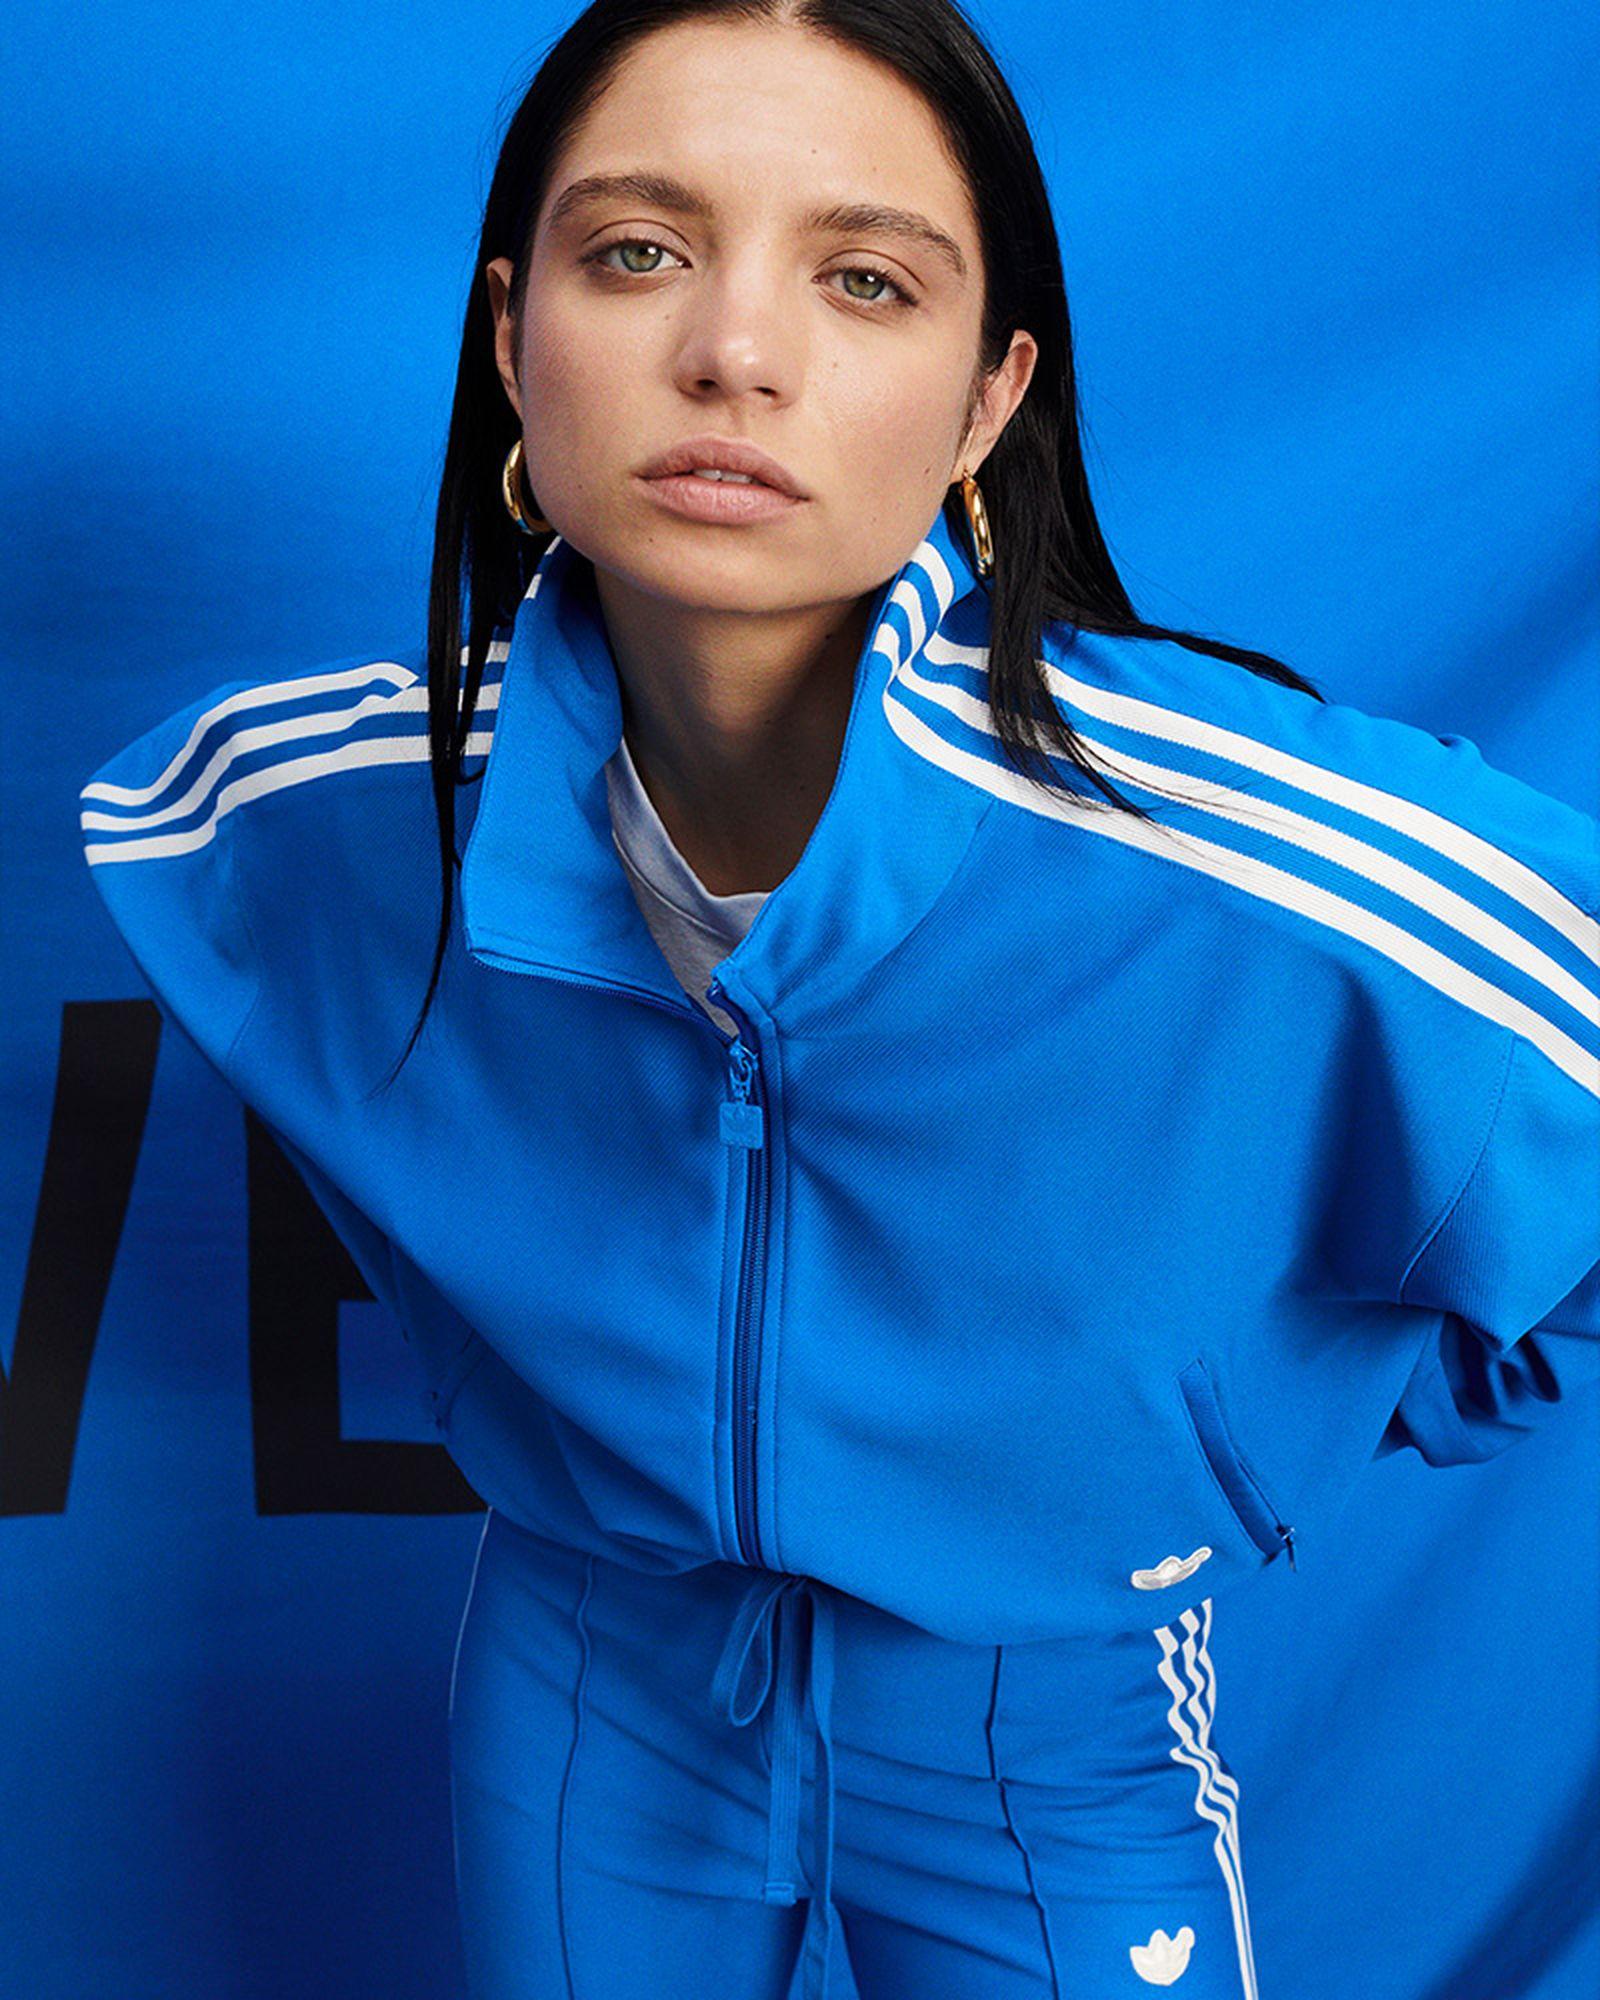 adidas-originals-blue-version-release-info-04